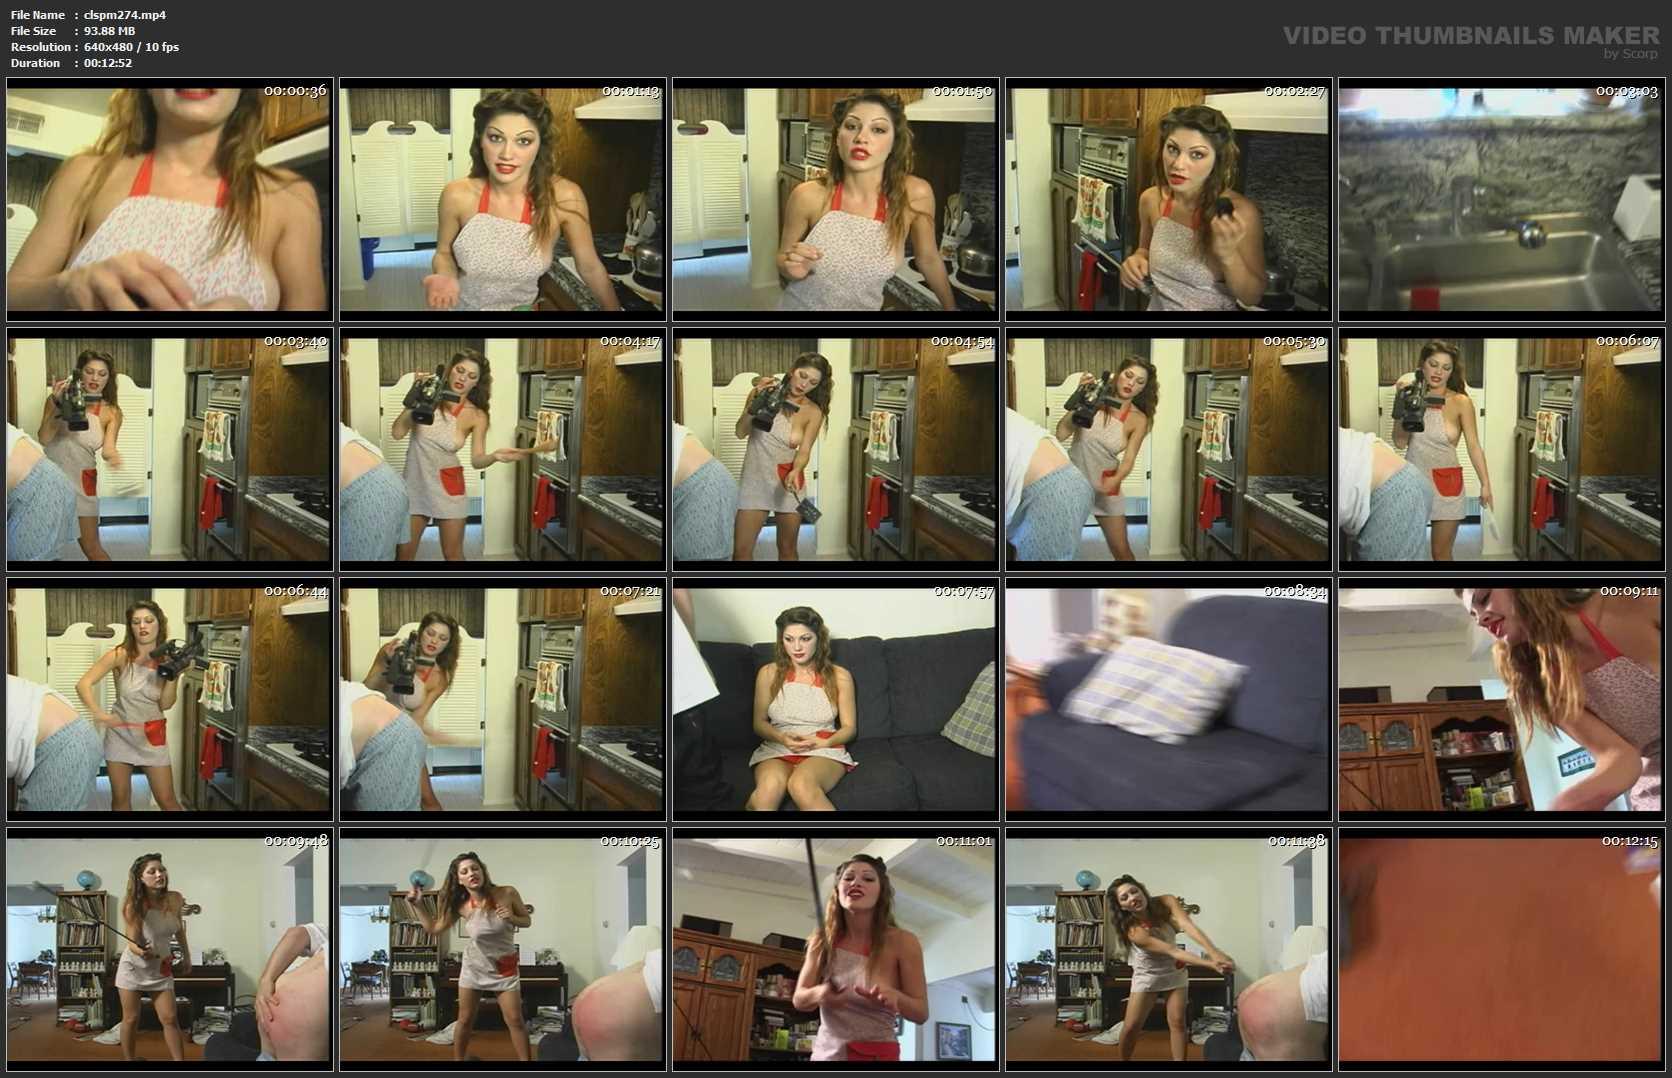 Kay Richards In Scene: Kay Richards Marriage Proposal - CLARESPANKSMEN - SD/480p/MP4